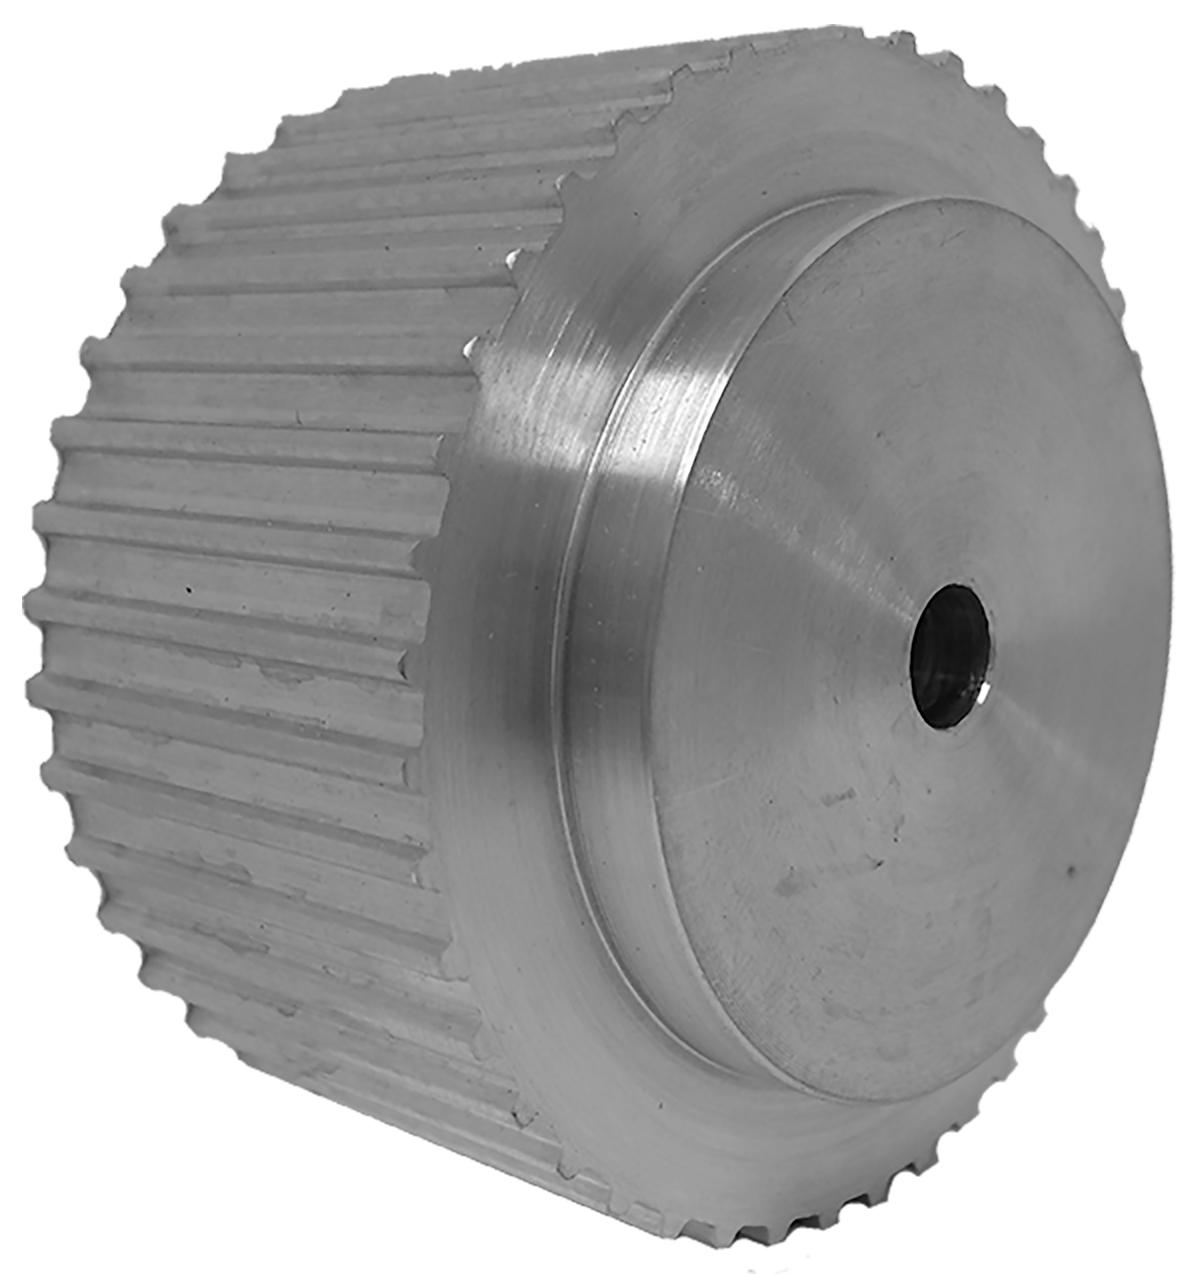 38AT5/44-0 - Aluminum Metric Pulleys